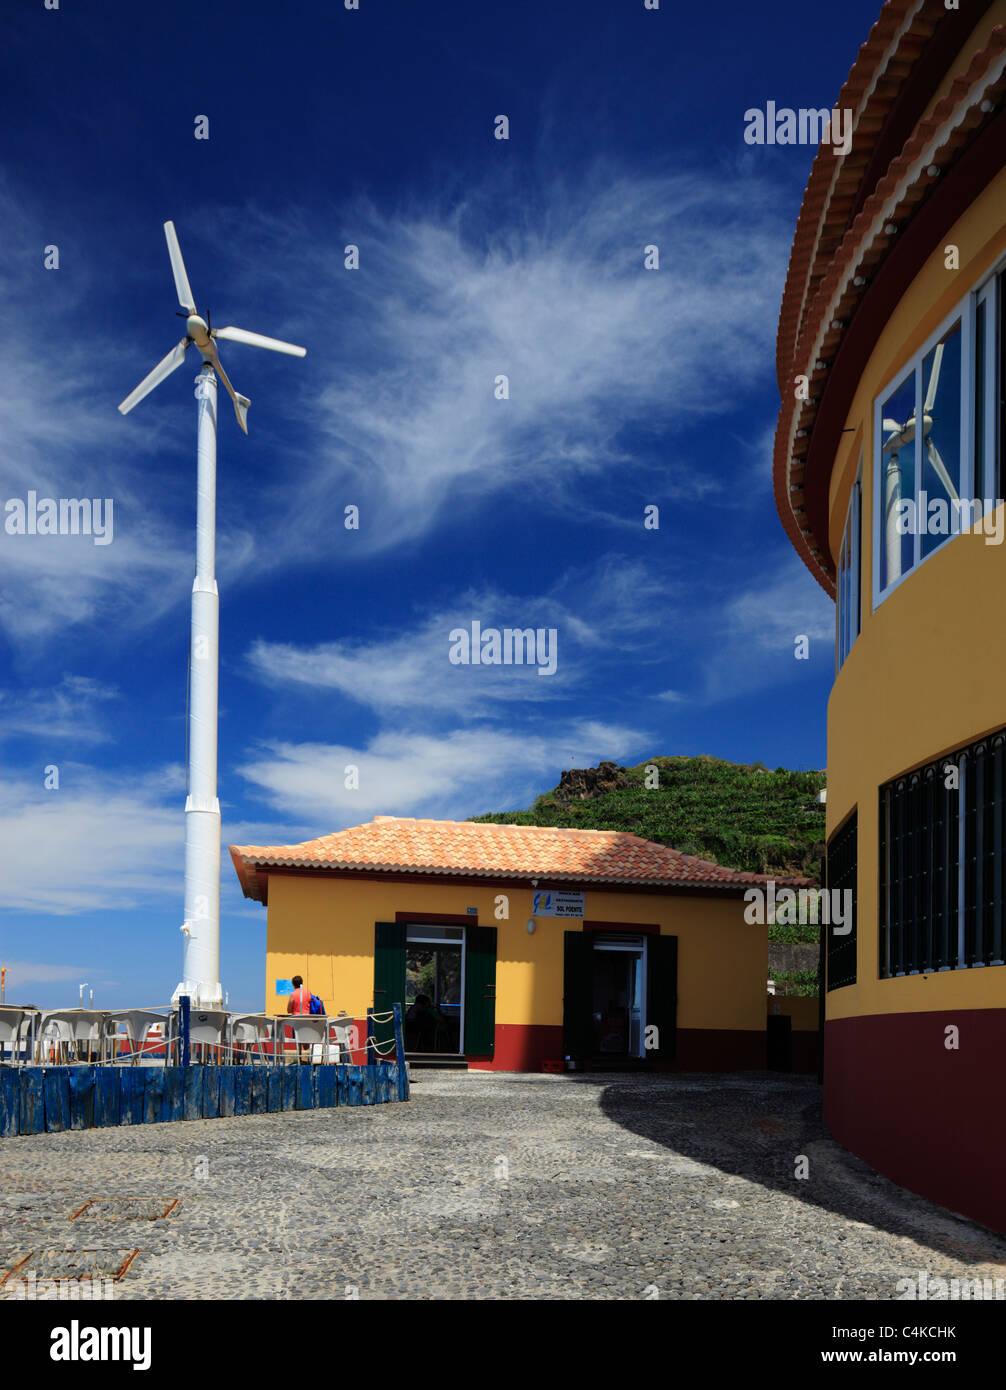 Restaurant with it's own wind turbine. Sol Poente, Ponta do Sol, Madeira. - Stock Image